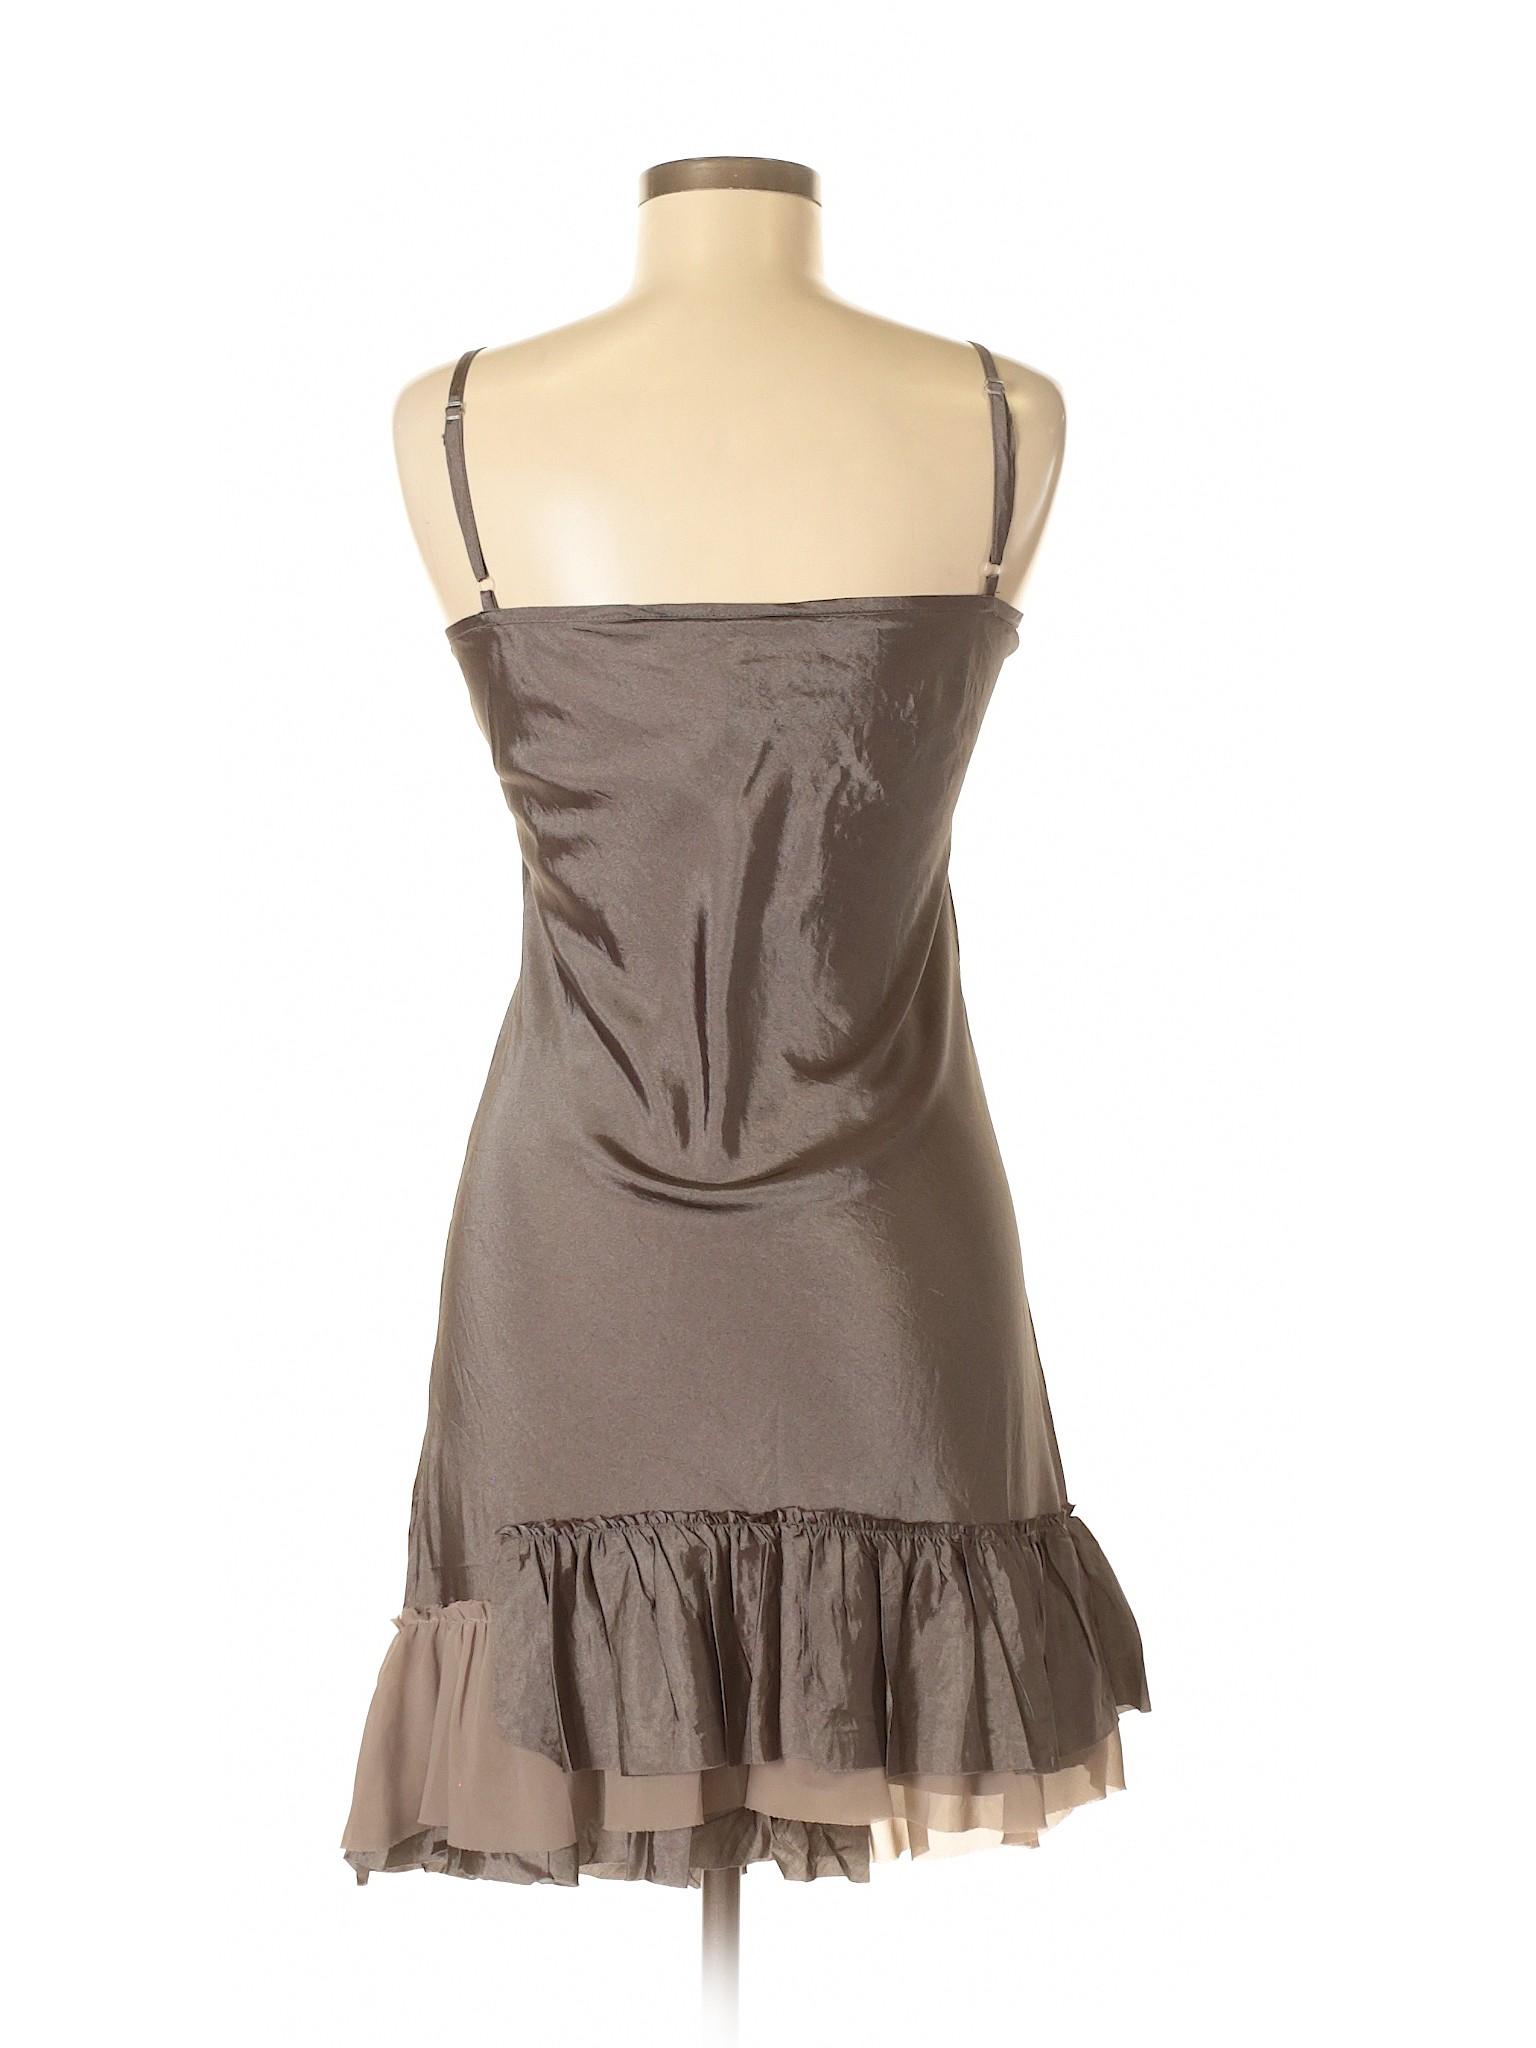 Cocktail Renee Boutique winter Dress C w0RzgqxSt